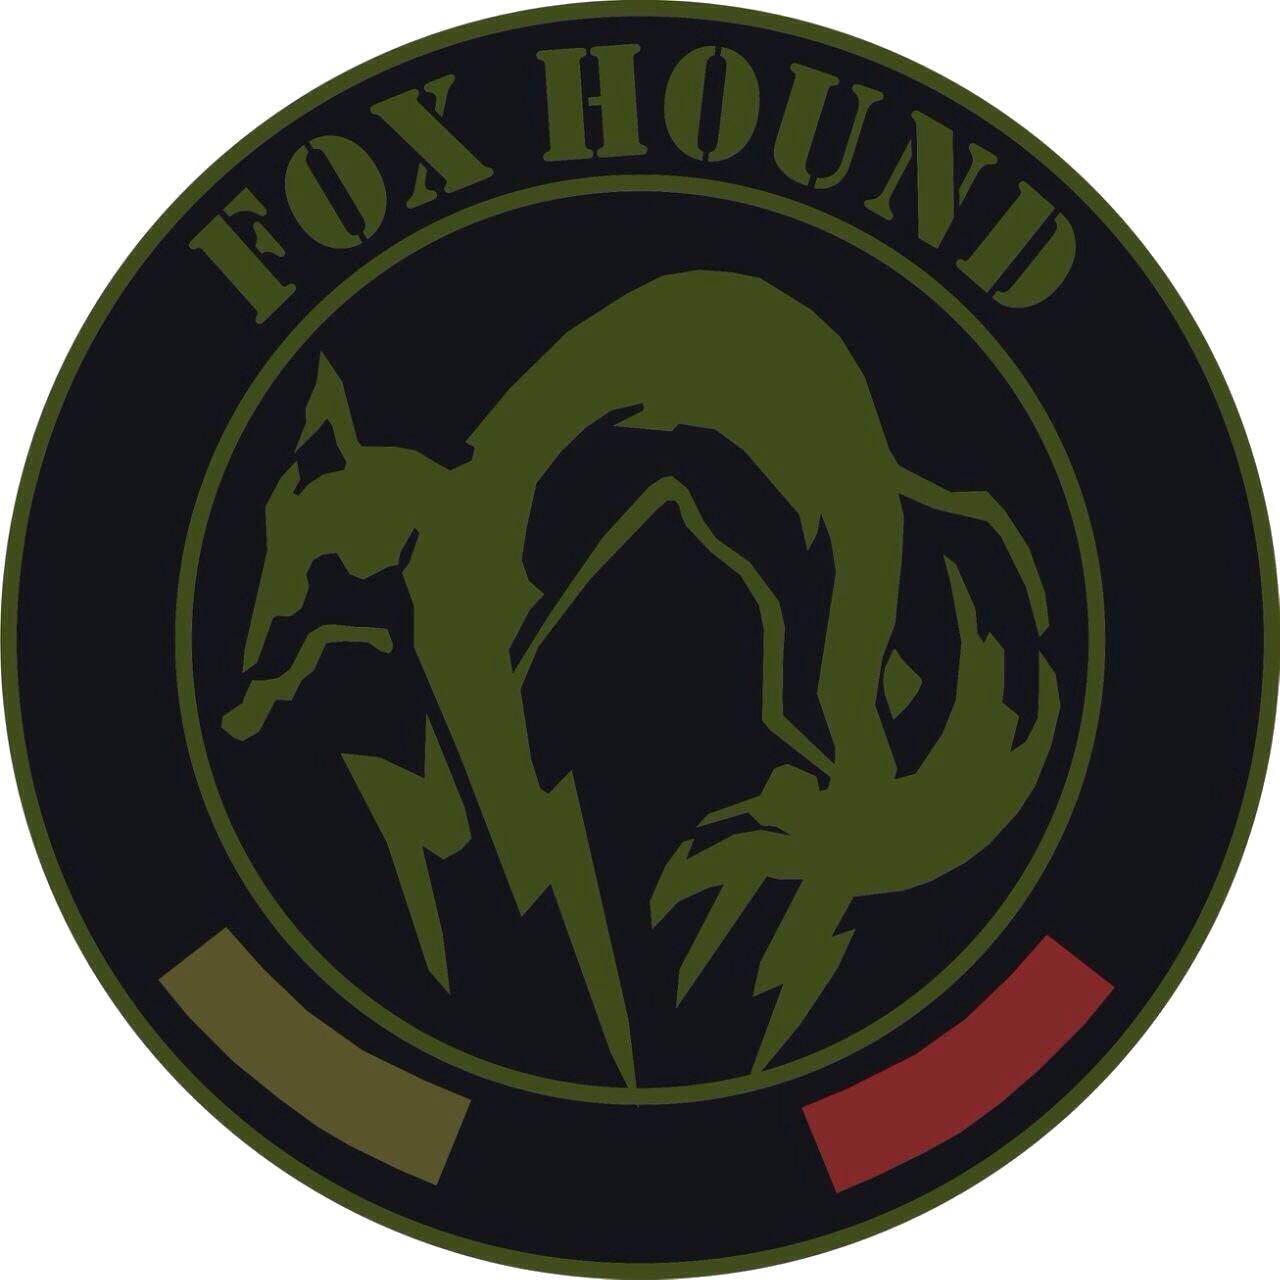 foxhoundsoftair